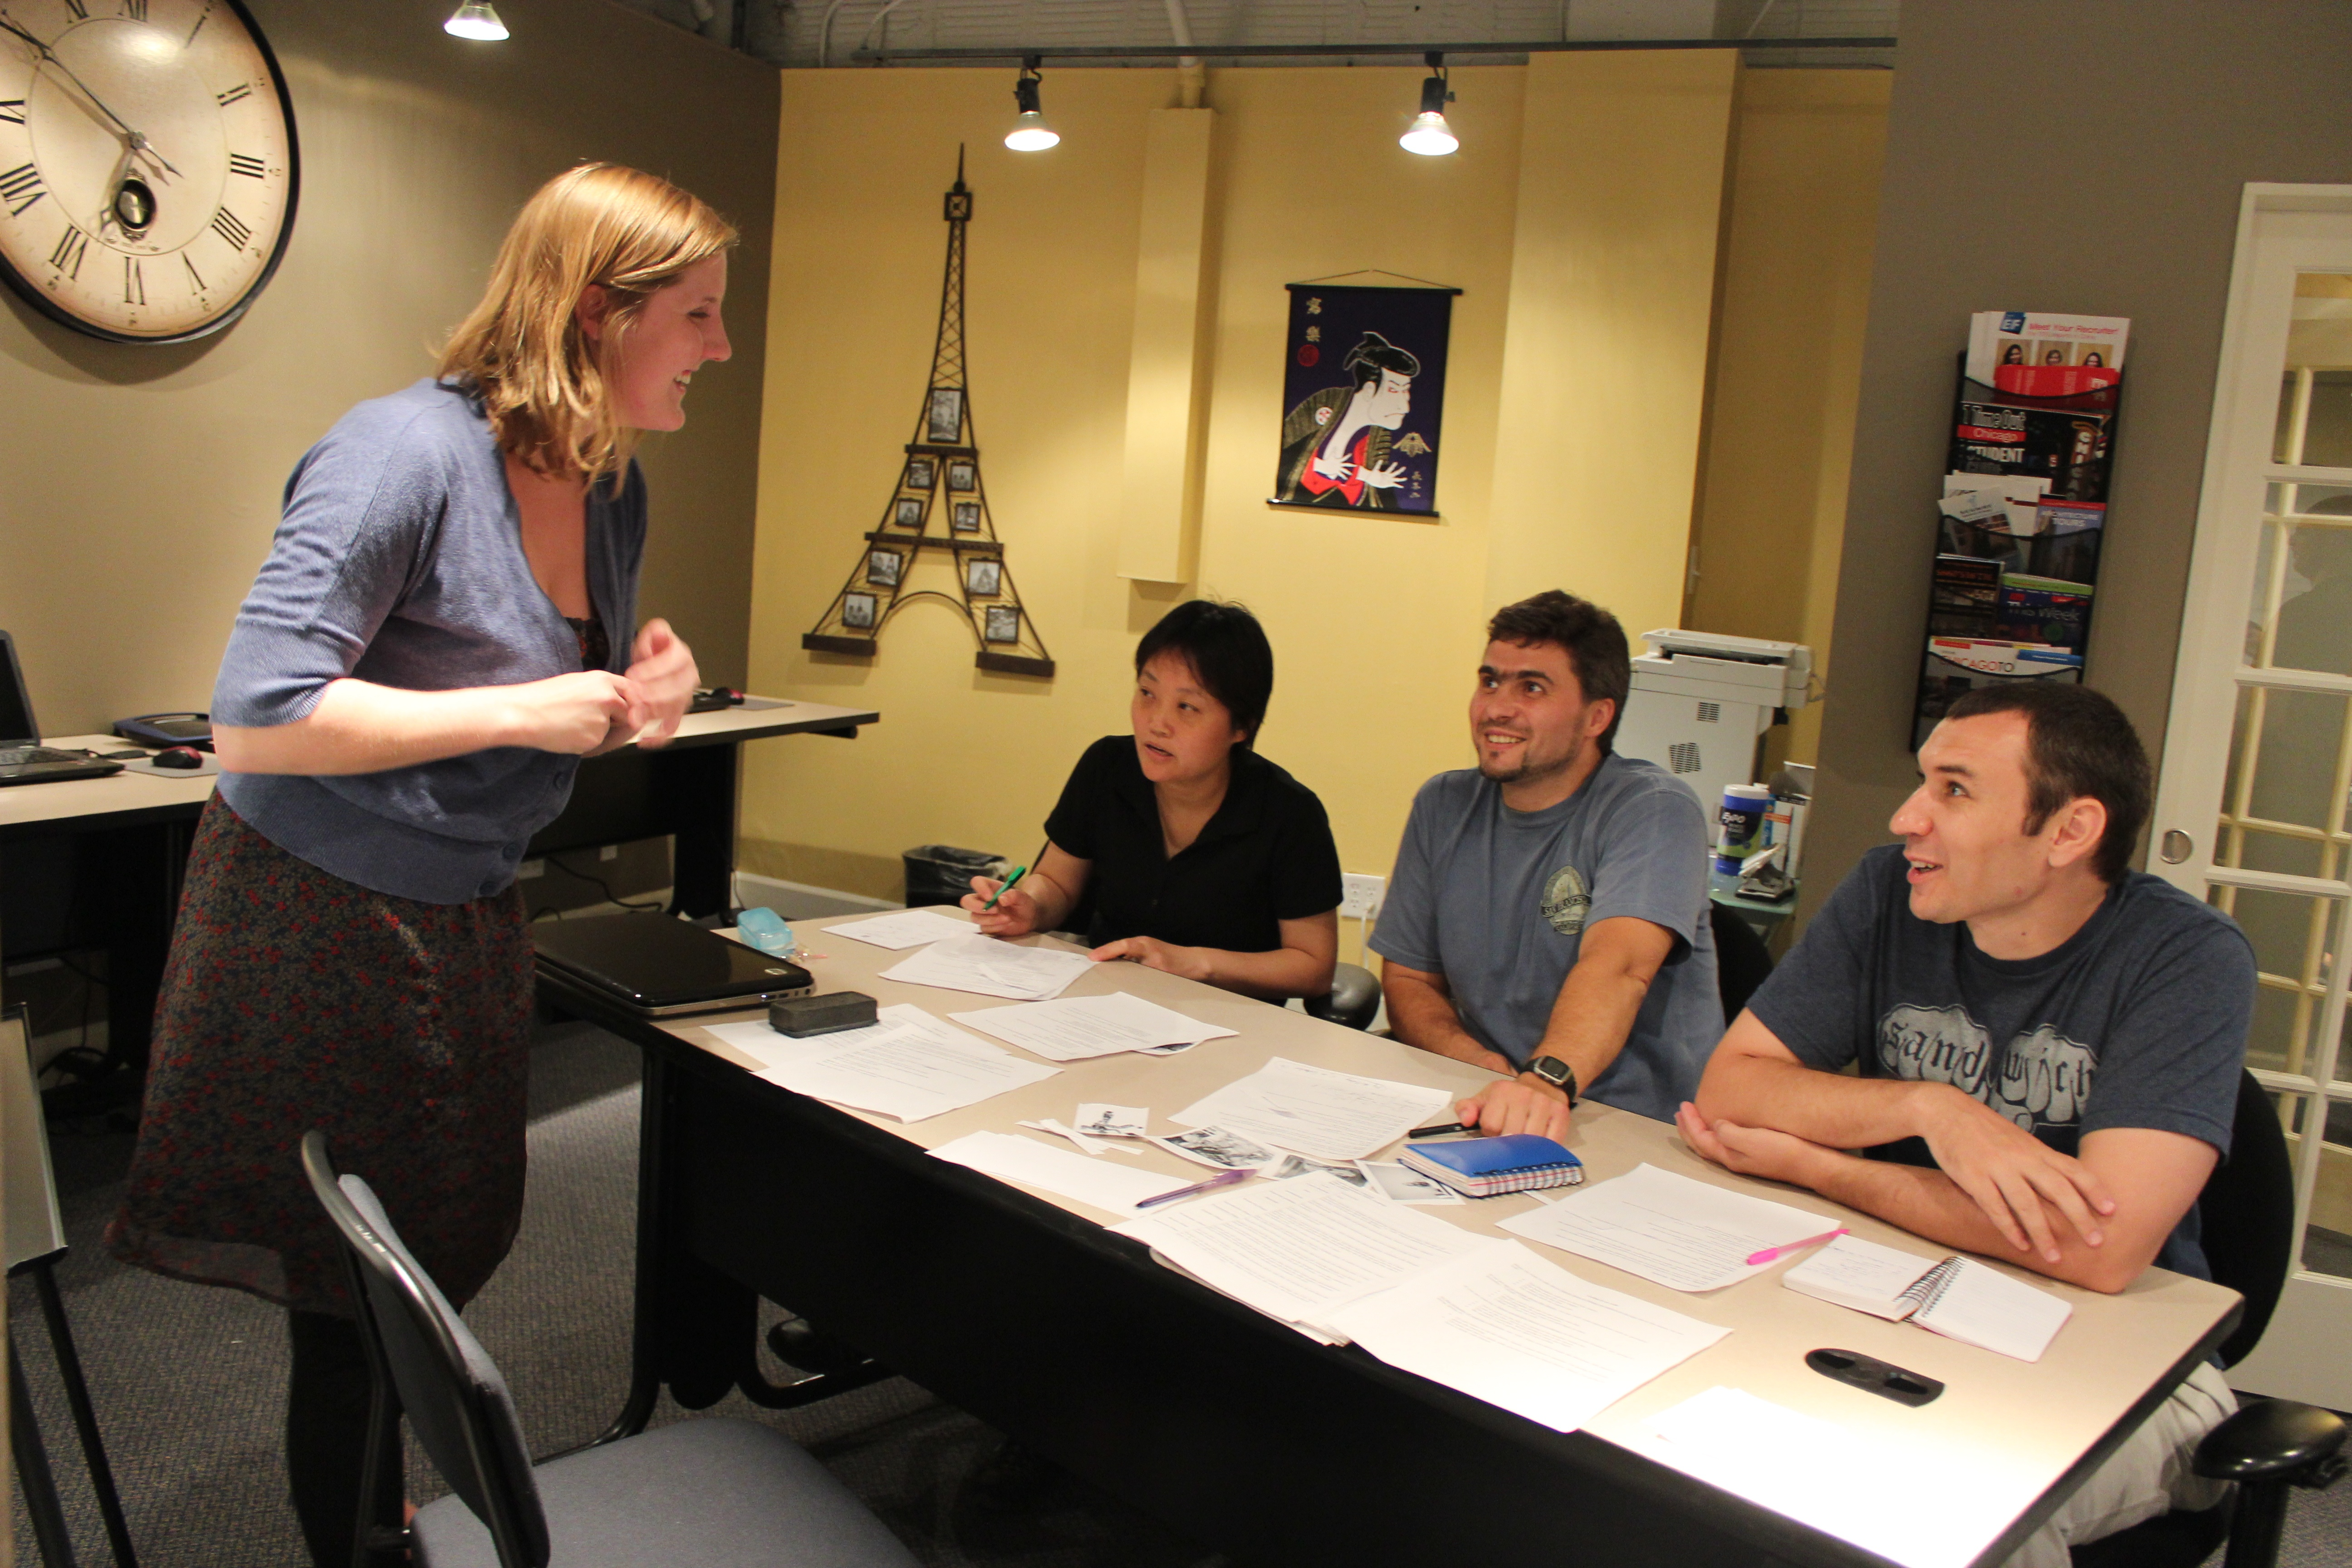 How to get a job overseas teaching English